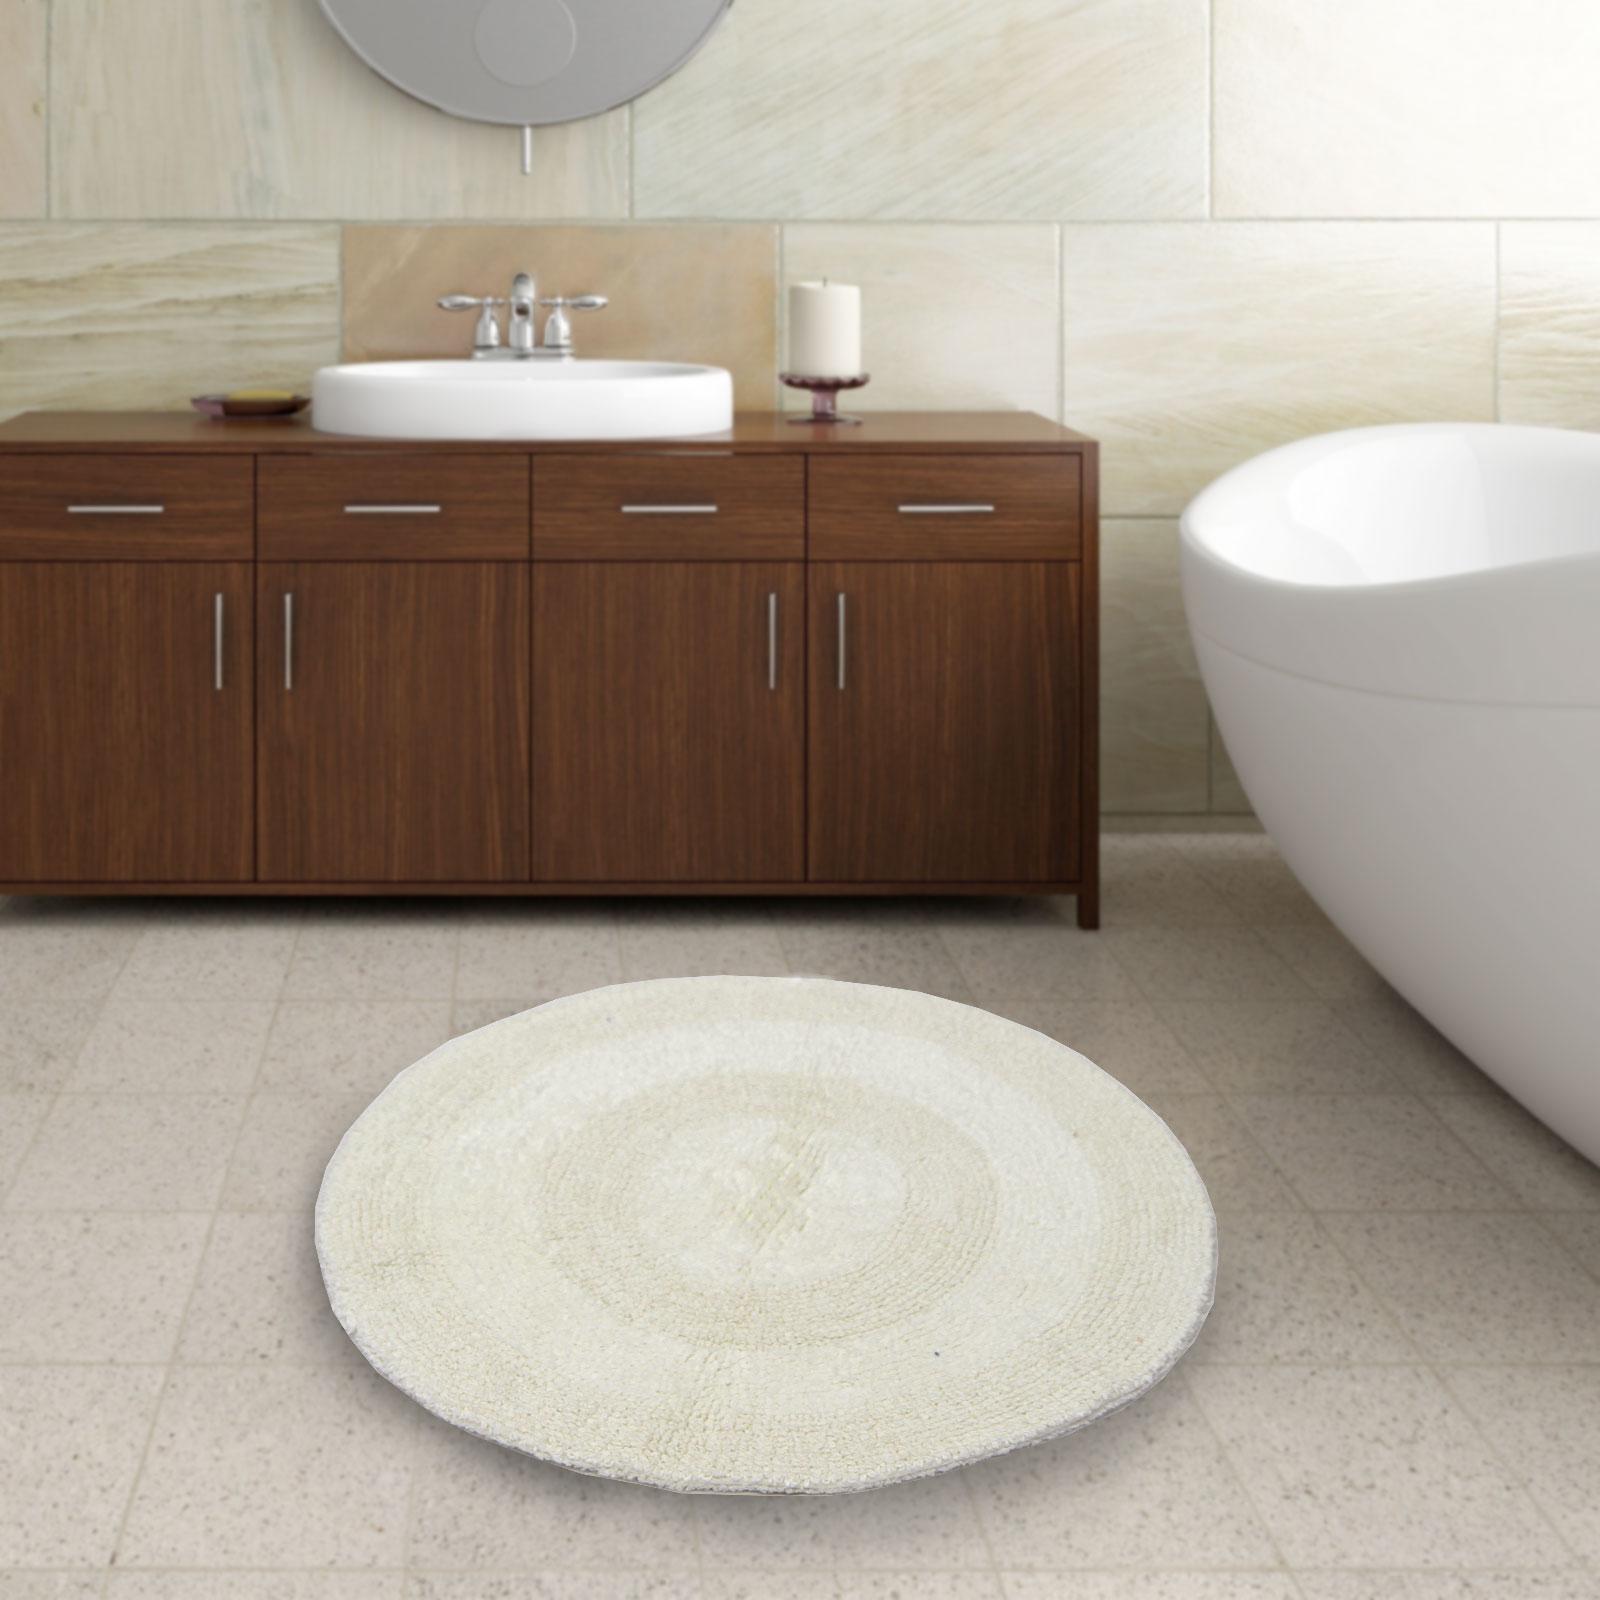 100% Cotton Plain Round Circular Bath Mat - Thick & Soft - Washable - 60cm